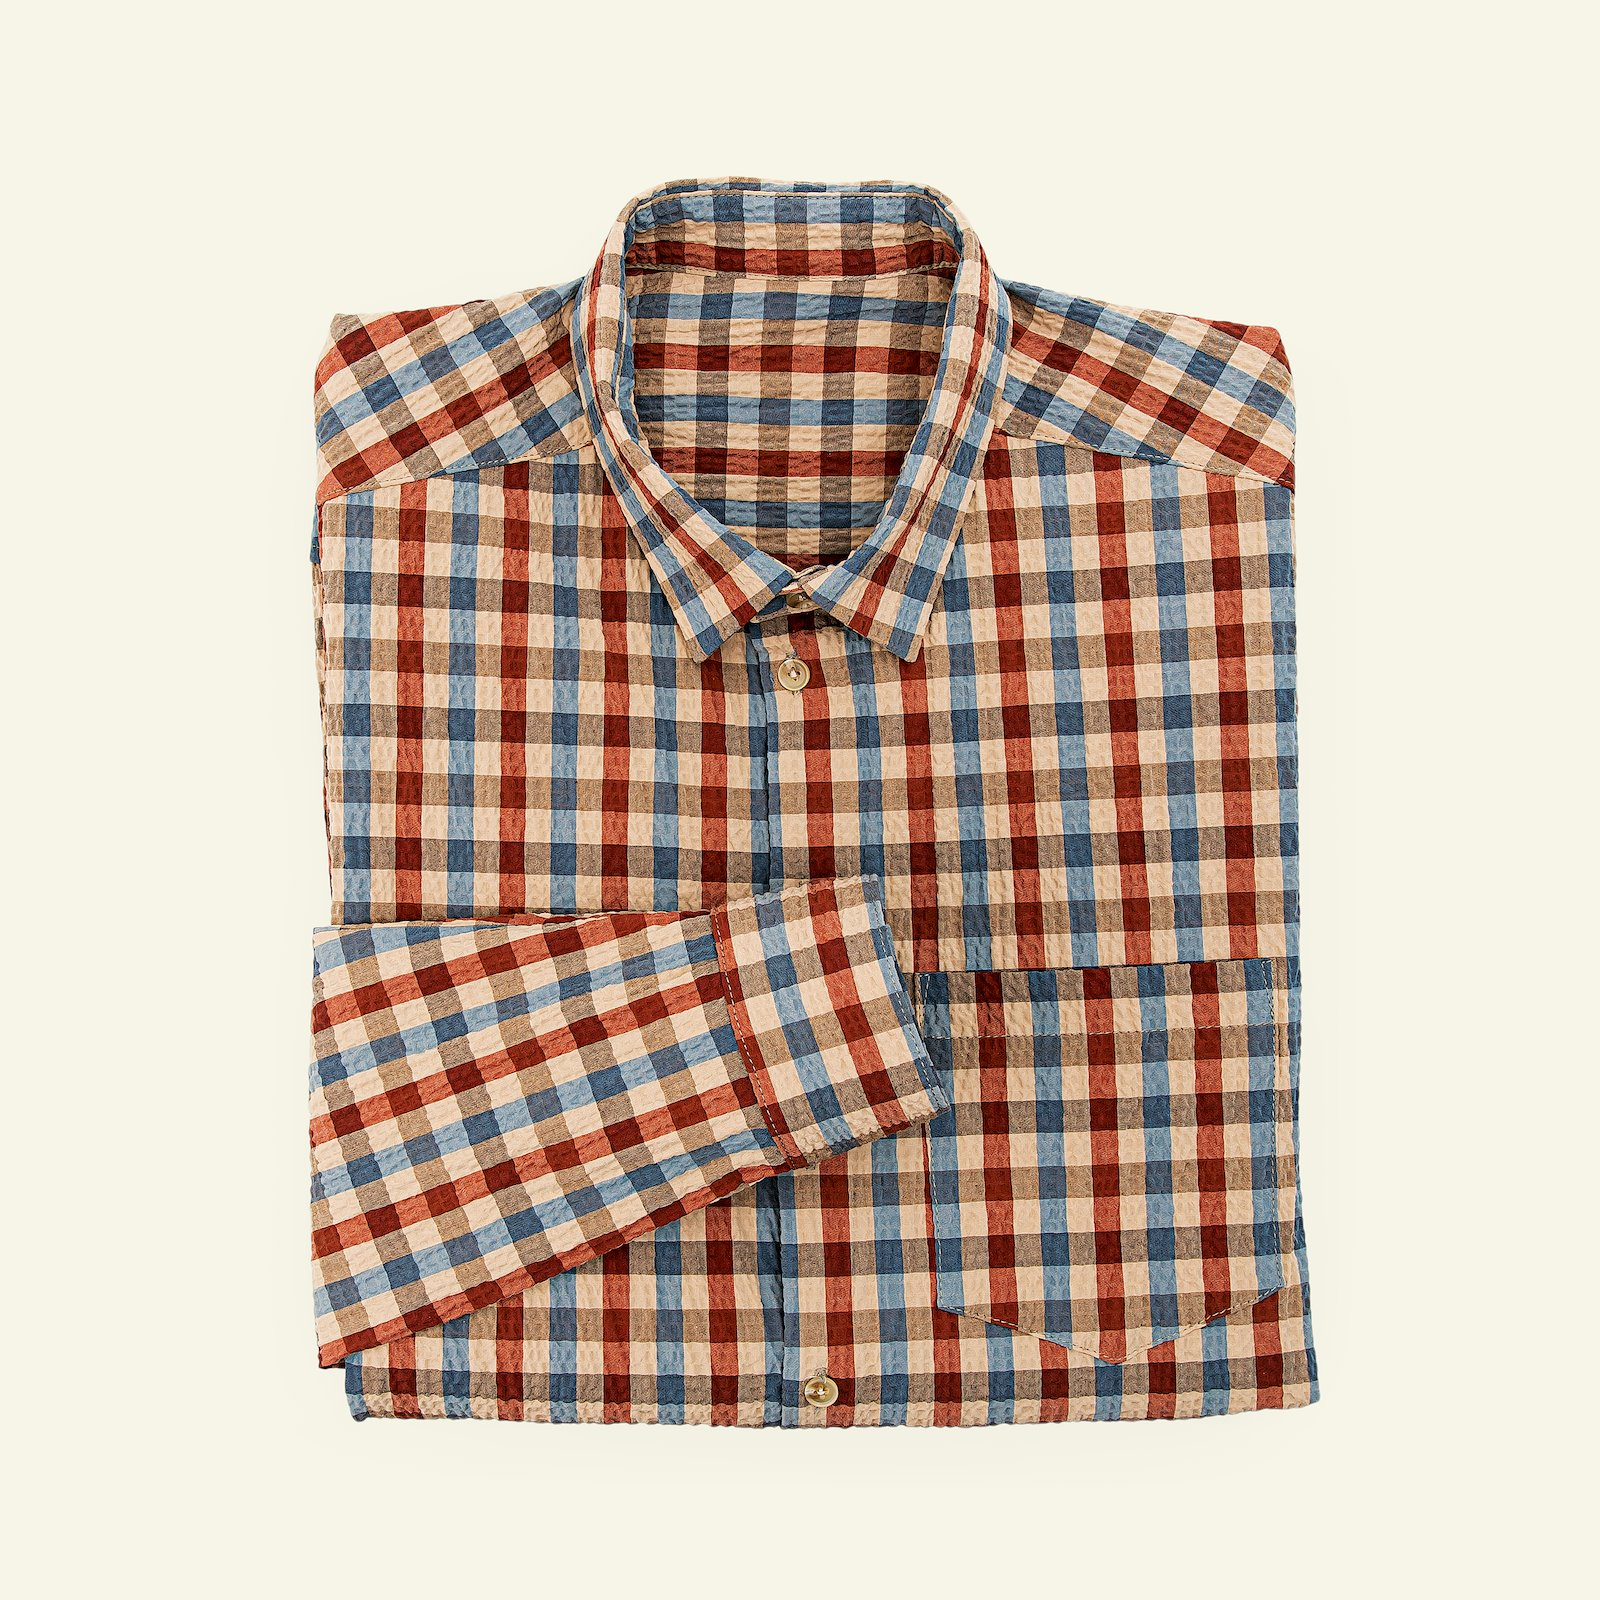 Shirt, M p87001_501898_40228_sskit